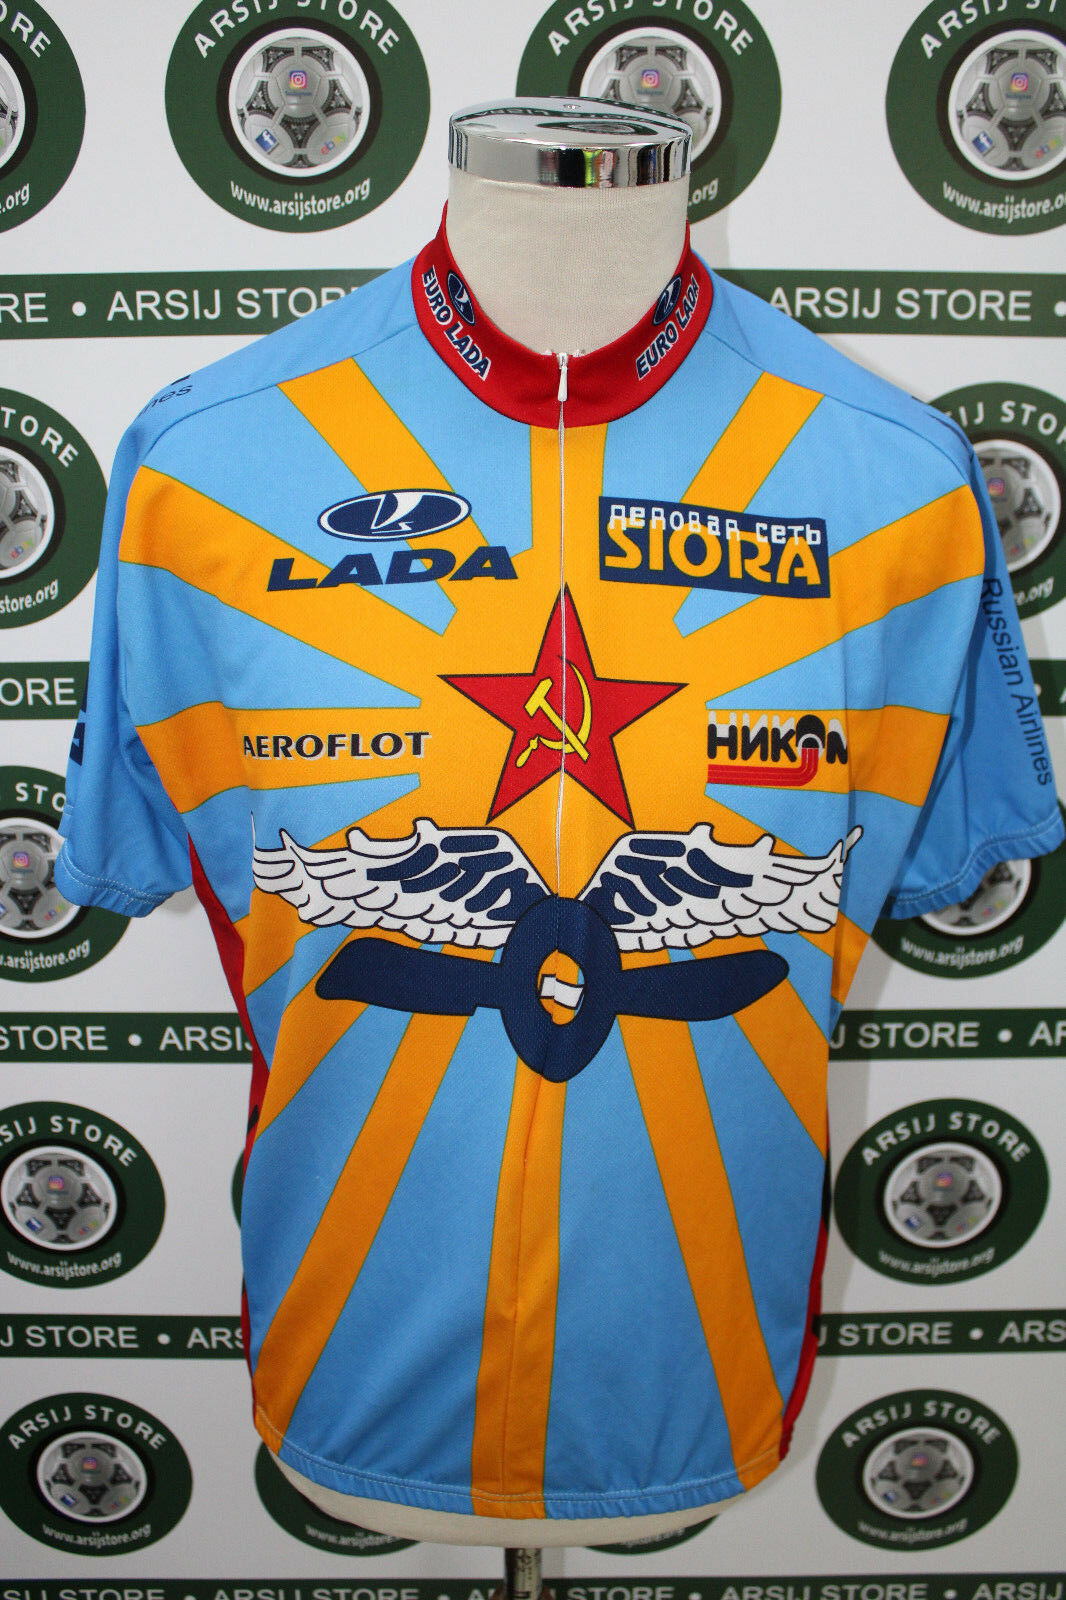 Maglia ciclismo bike shirt maillot trikot camiseta CCCP RUSSIA LADA TG XL F651